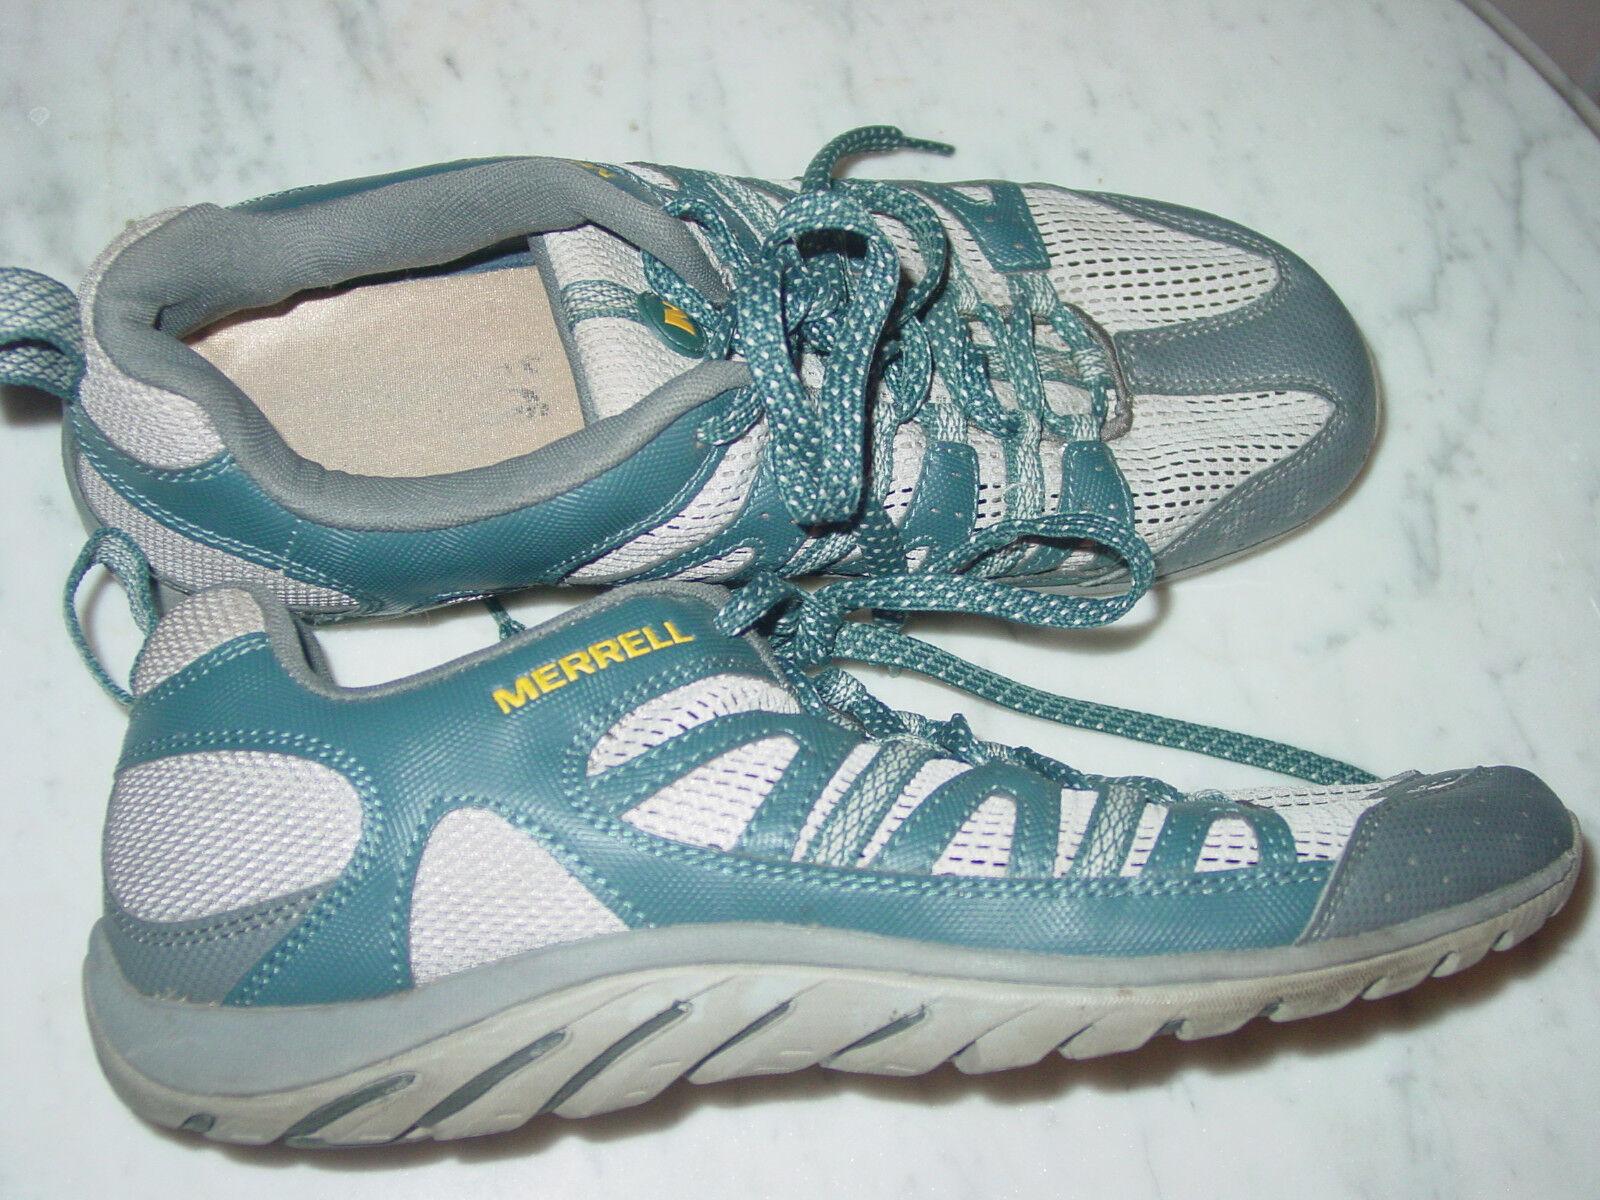 Uomo Merrell Trail/Hiking Schuhes   Größe 9.5 4a4758